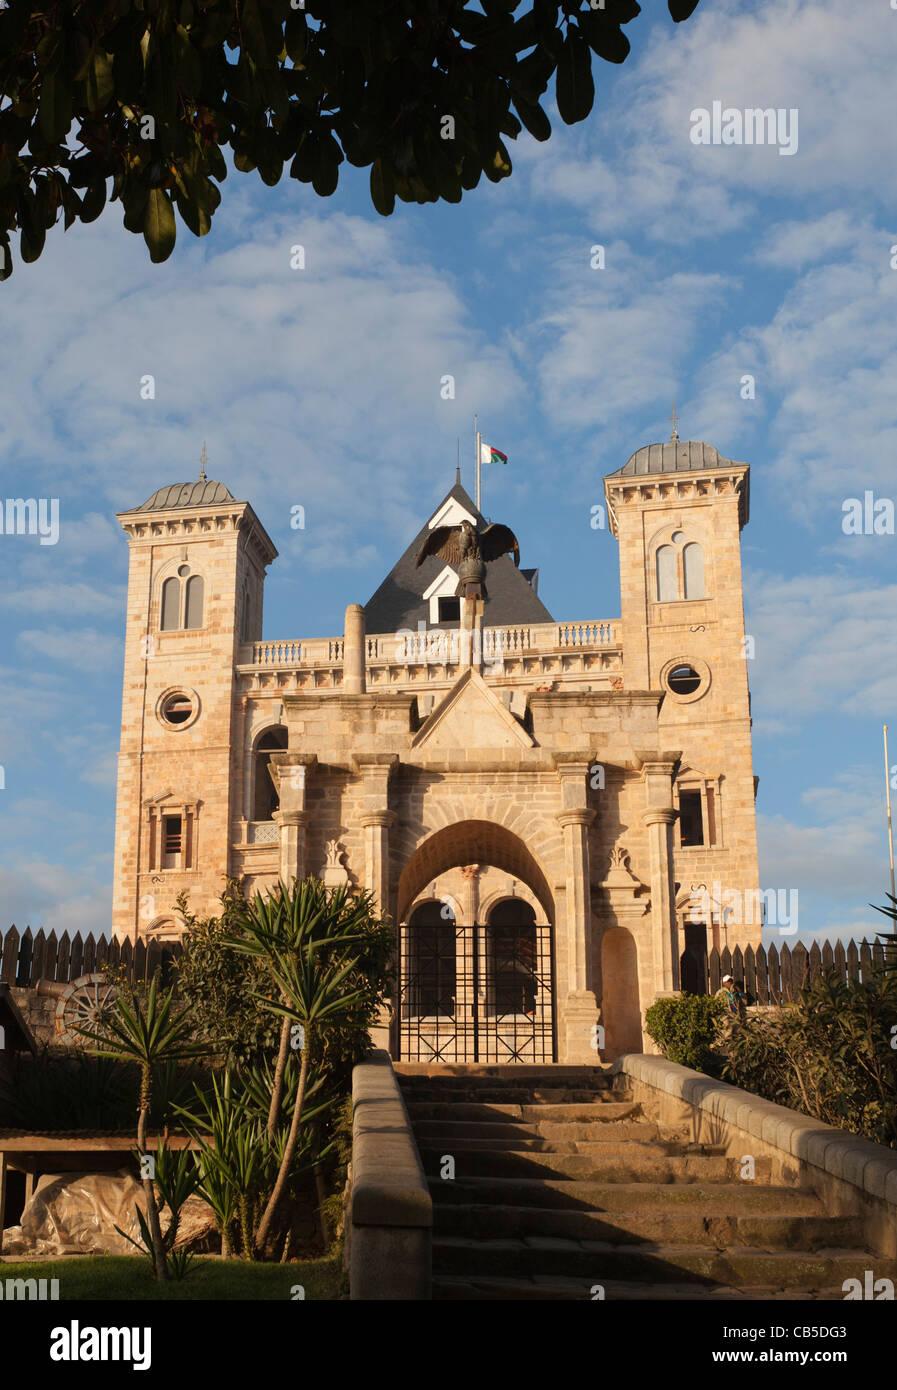 colonial era government building in Antananarivo, Madagascar - Stock Image